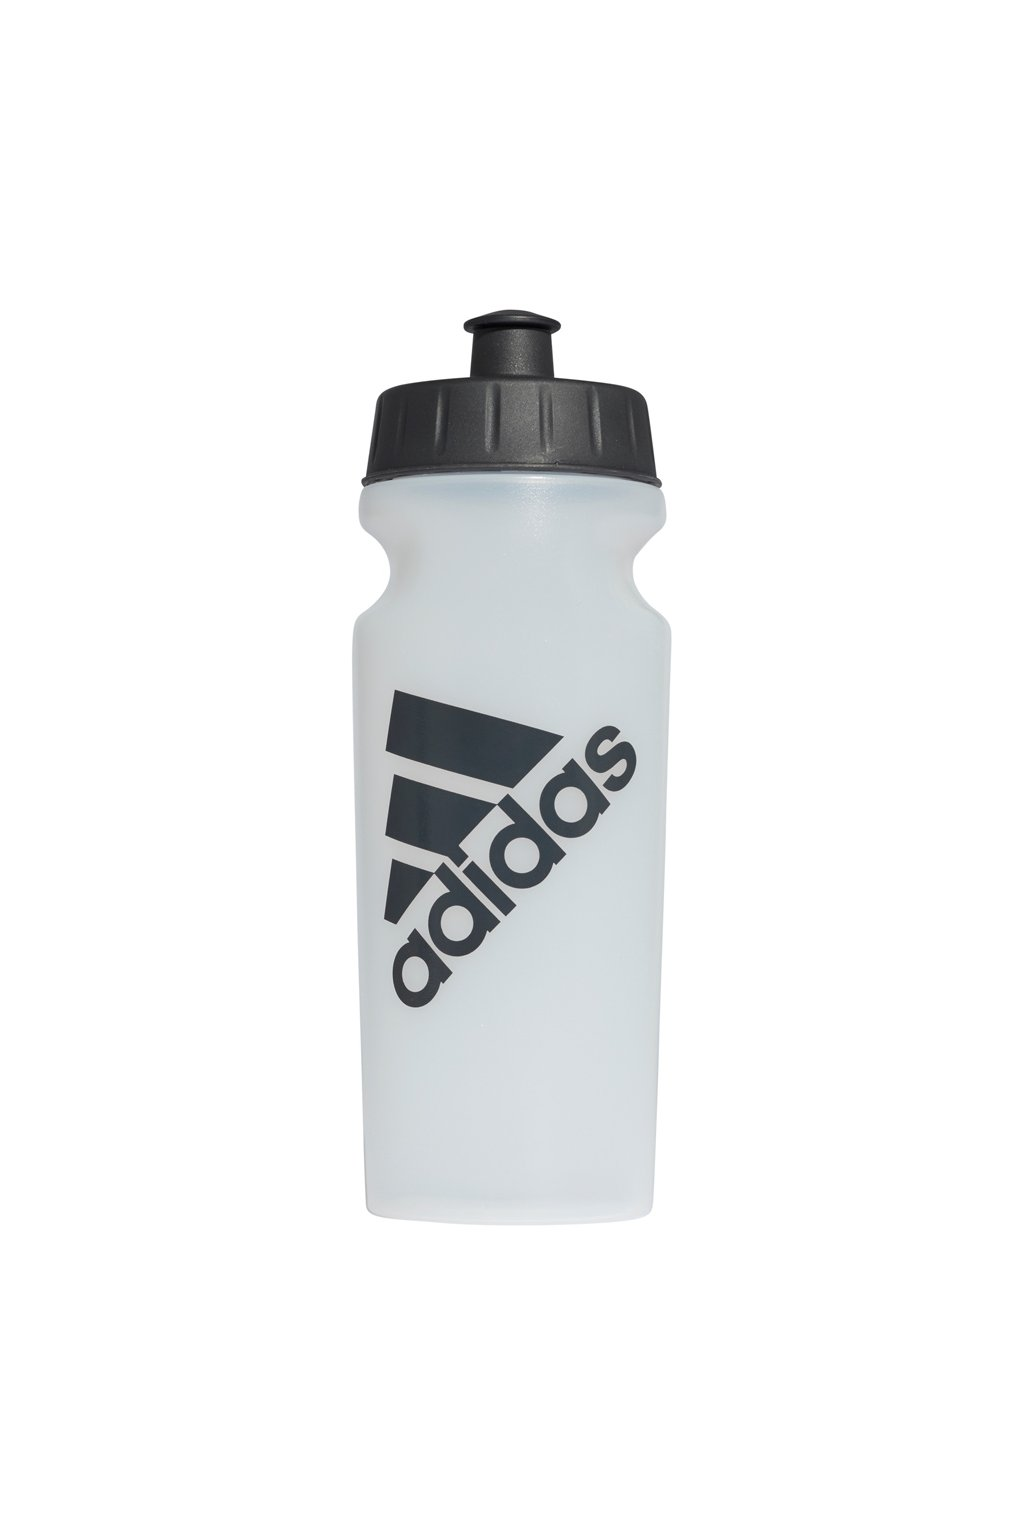 Fľaša Adidas Performance Bottle 500ml bielo čierna CD6280